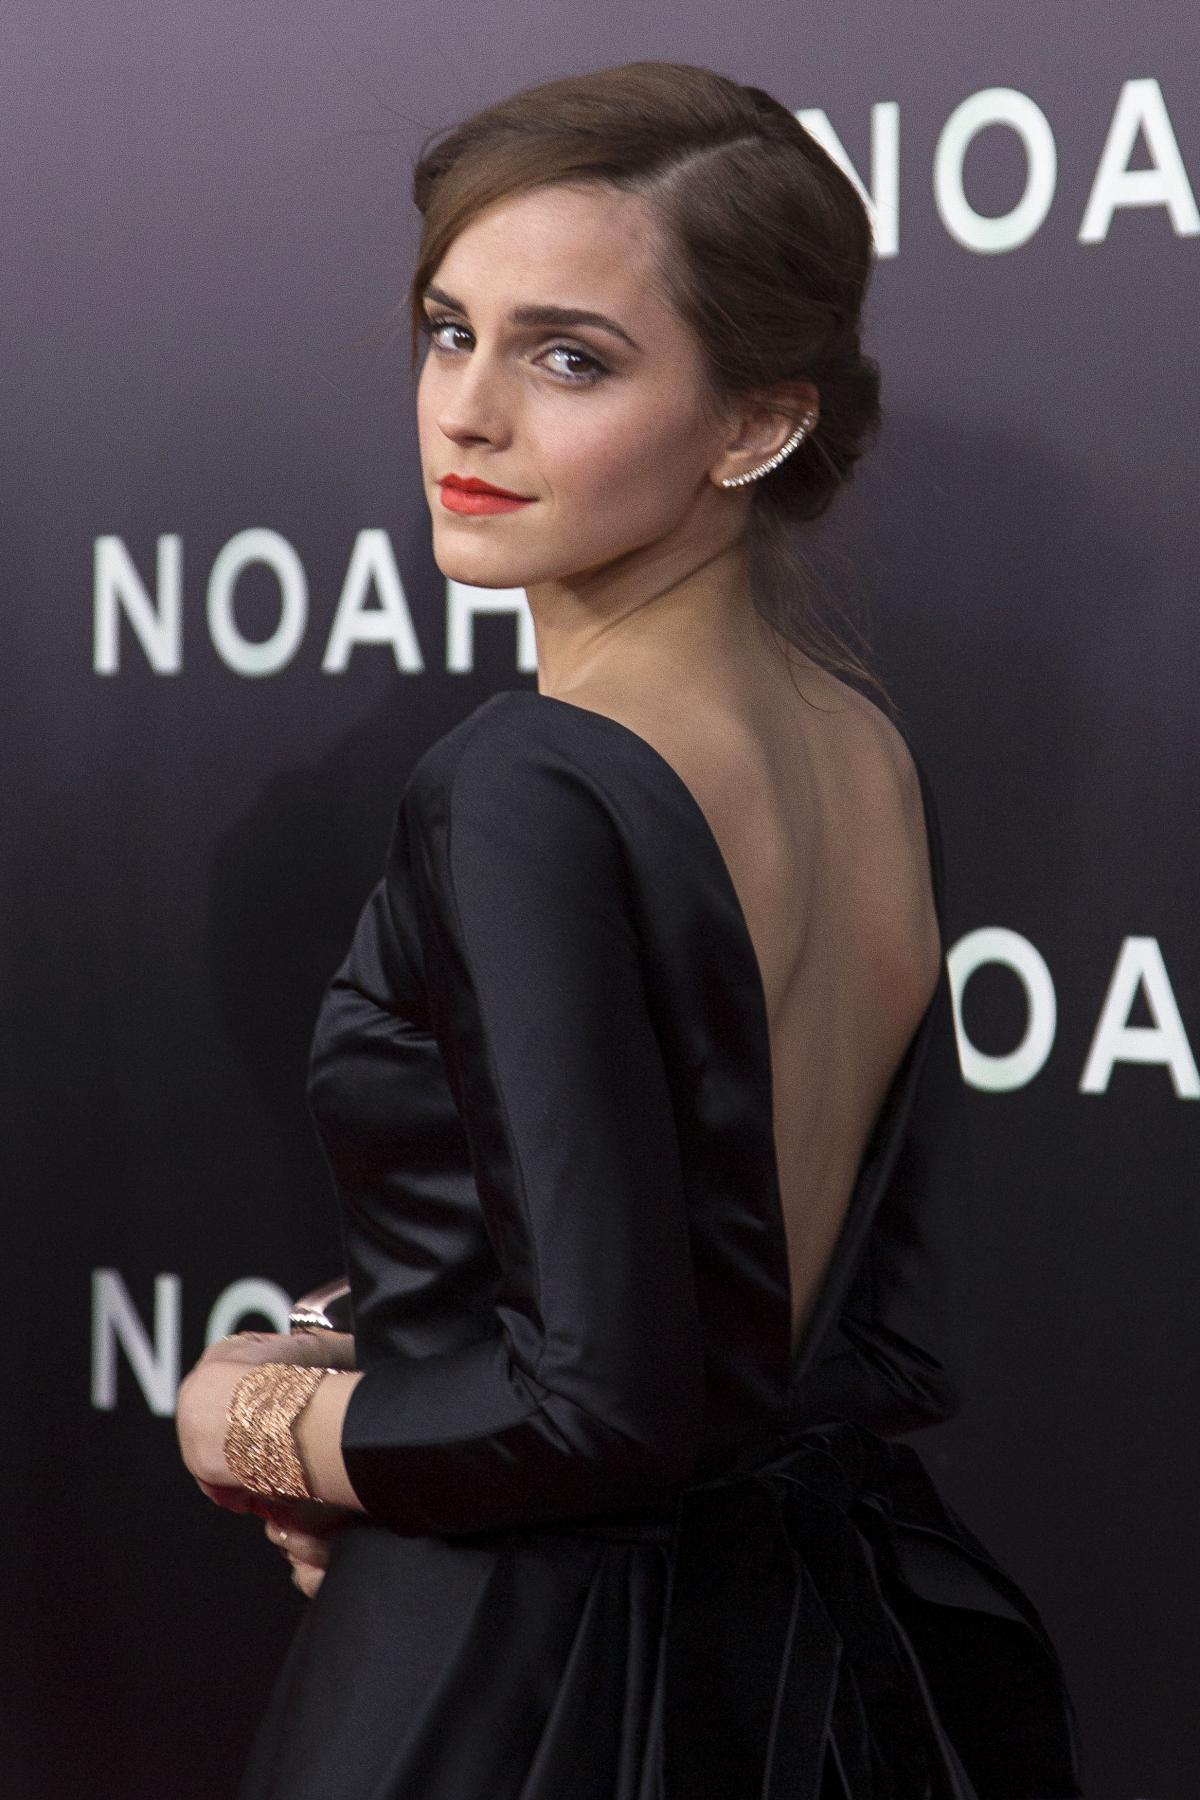 Emma Watson Ive No Fear Of Getting Old Despite Fashion